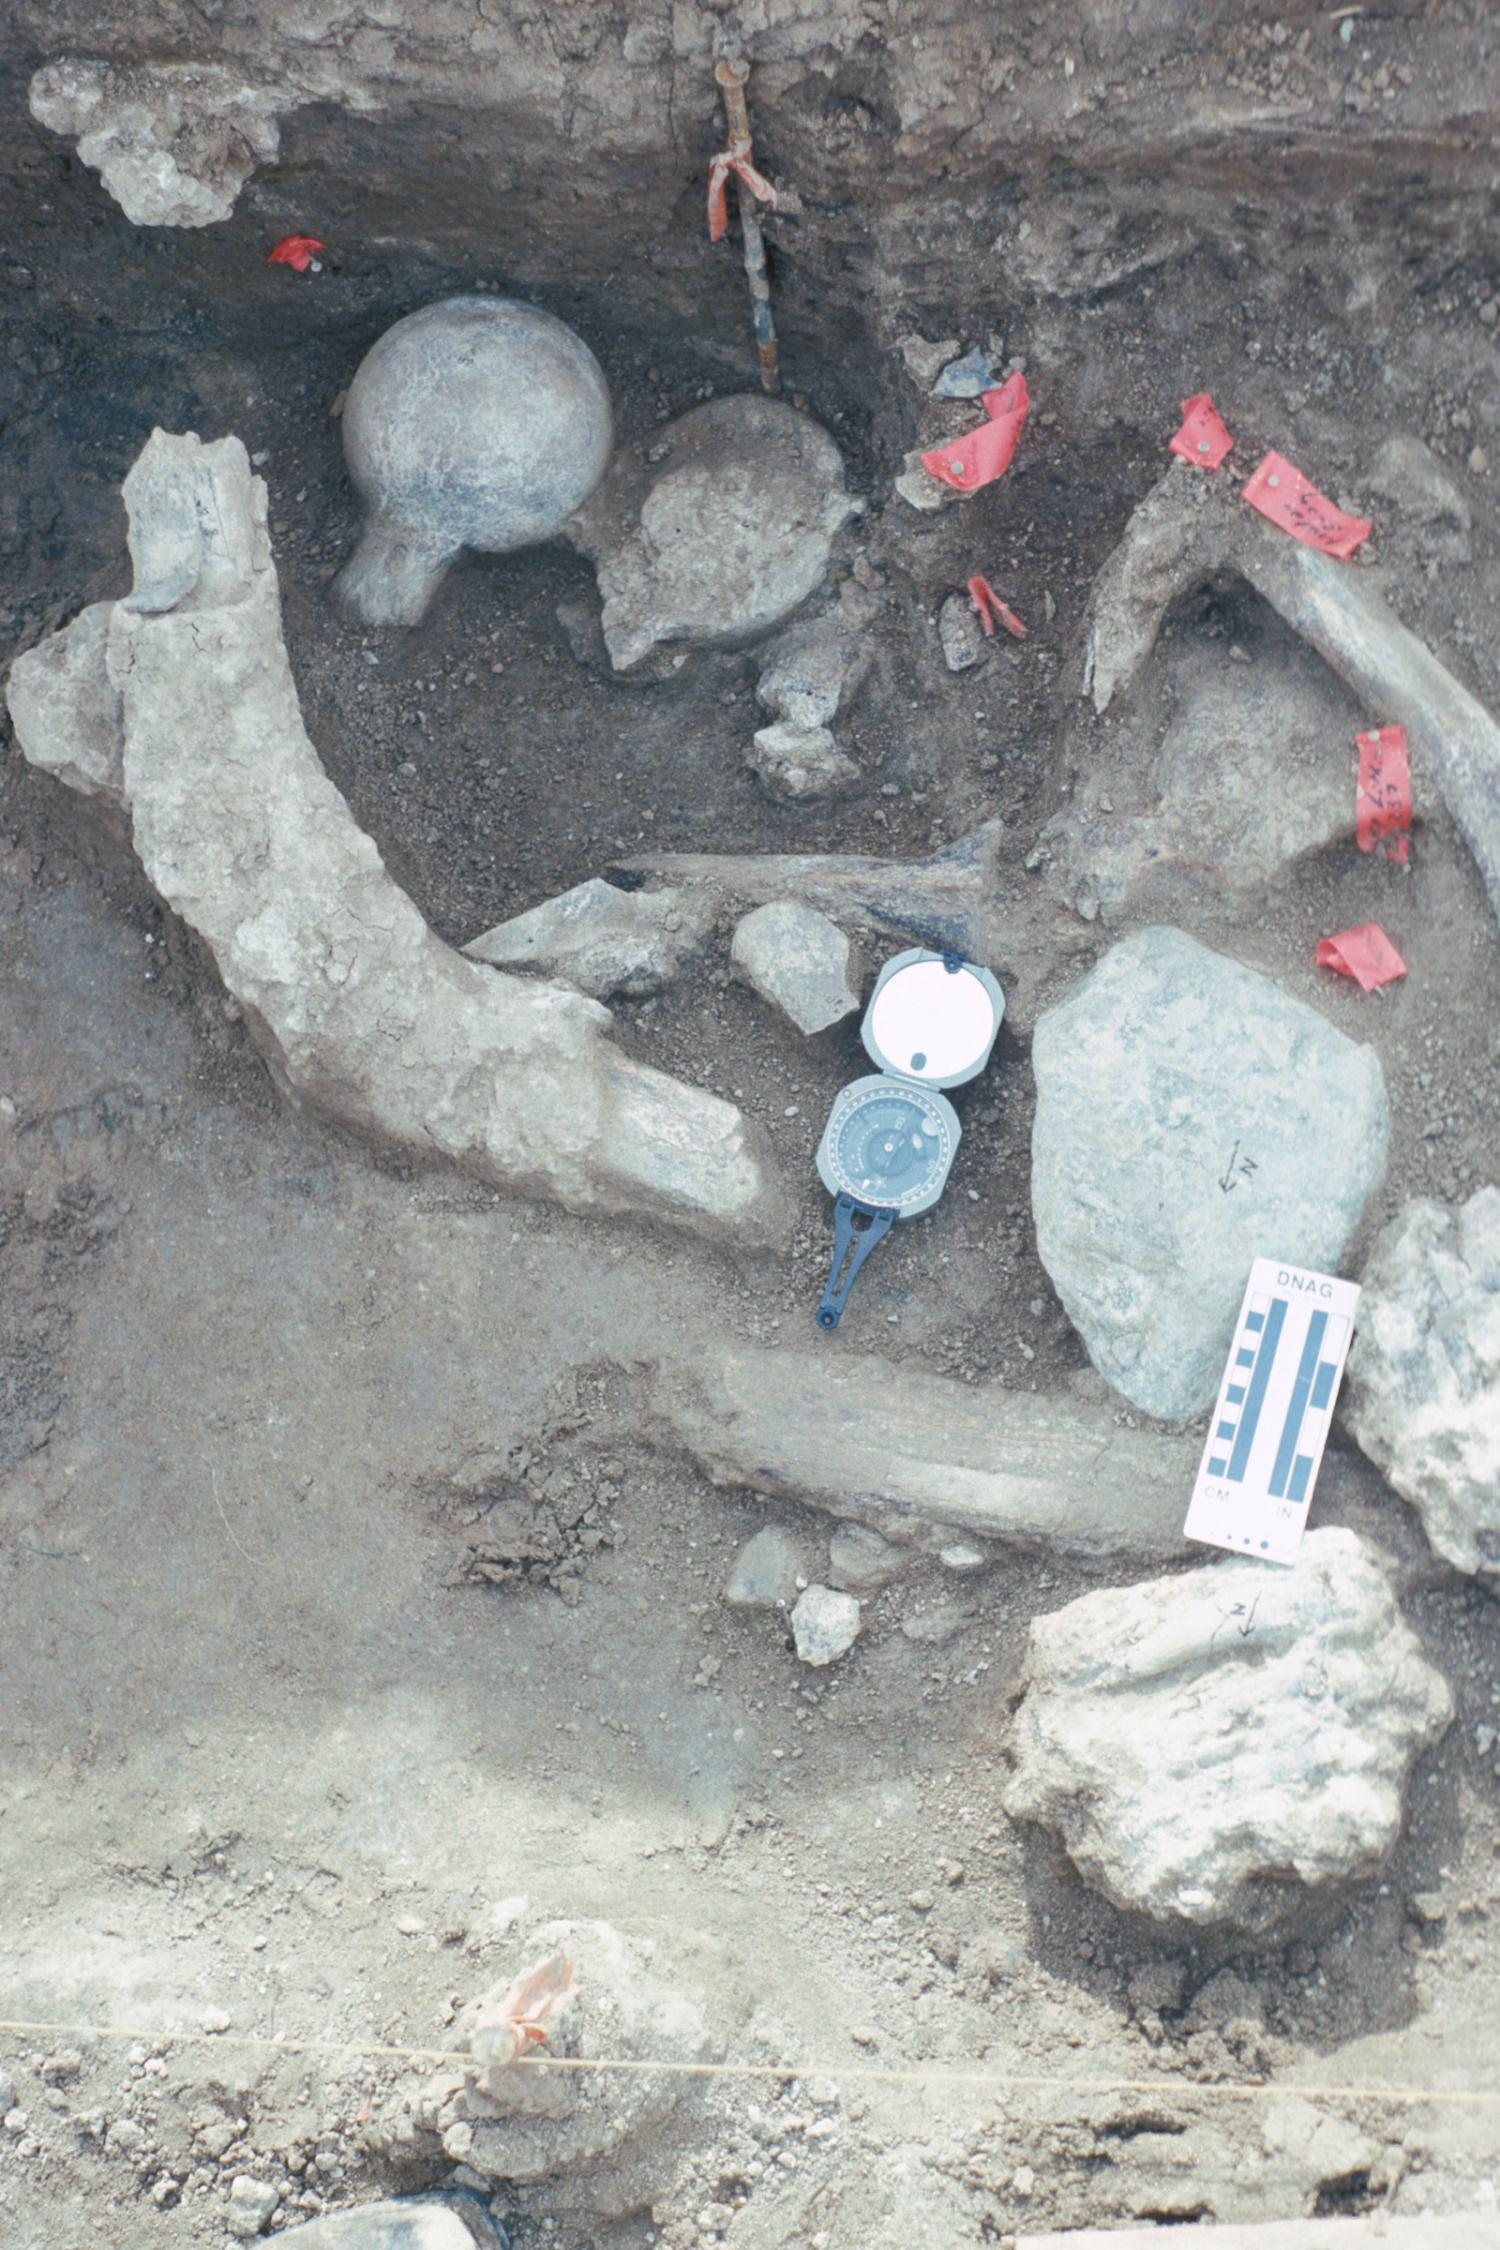 Останки мастодонта игалька из Черутти-Мастодонт.